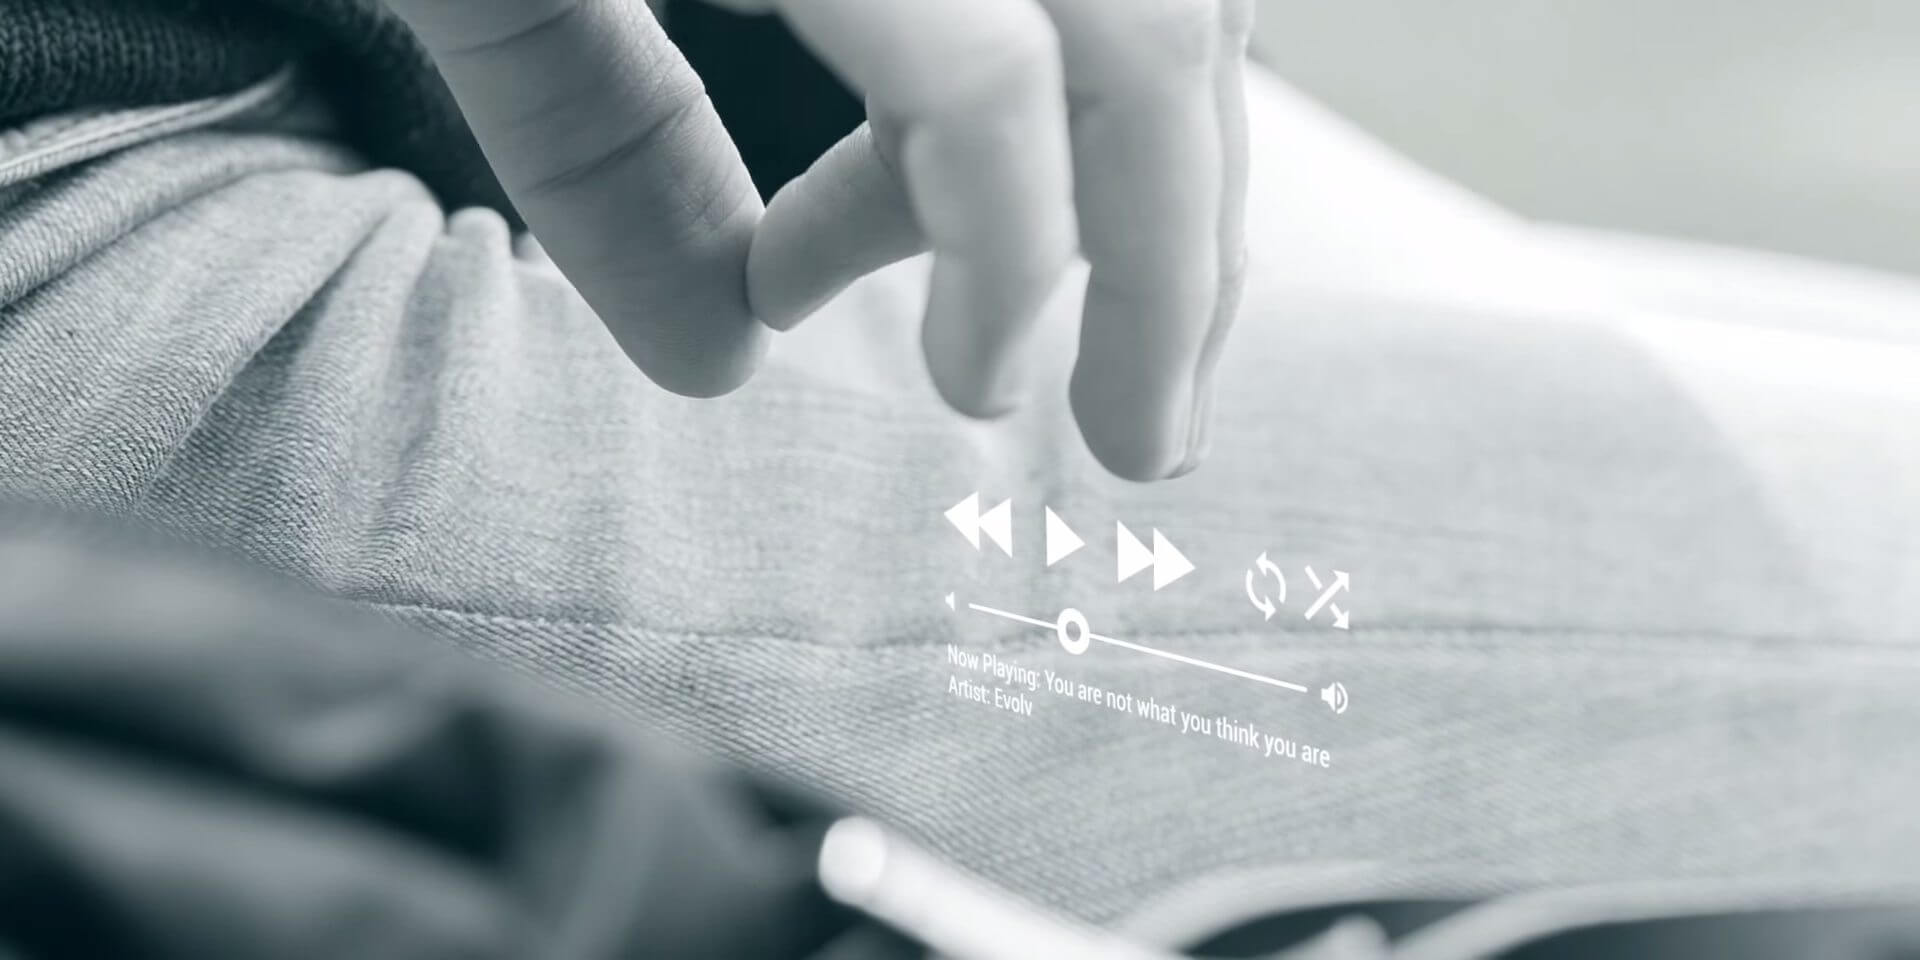 project soli 5 - Google revela Project Soli, tecnologia para rastrear movimentos